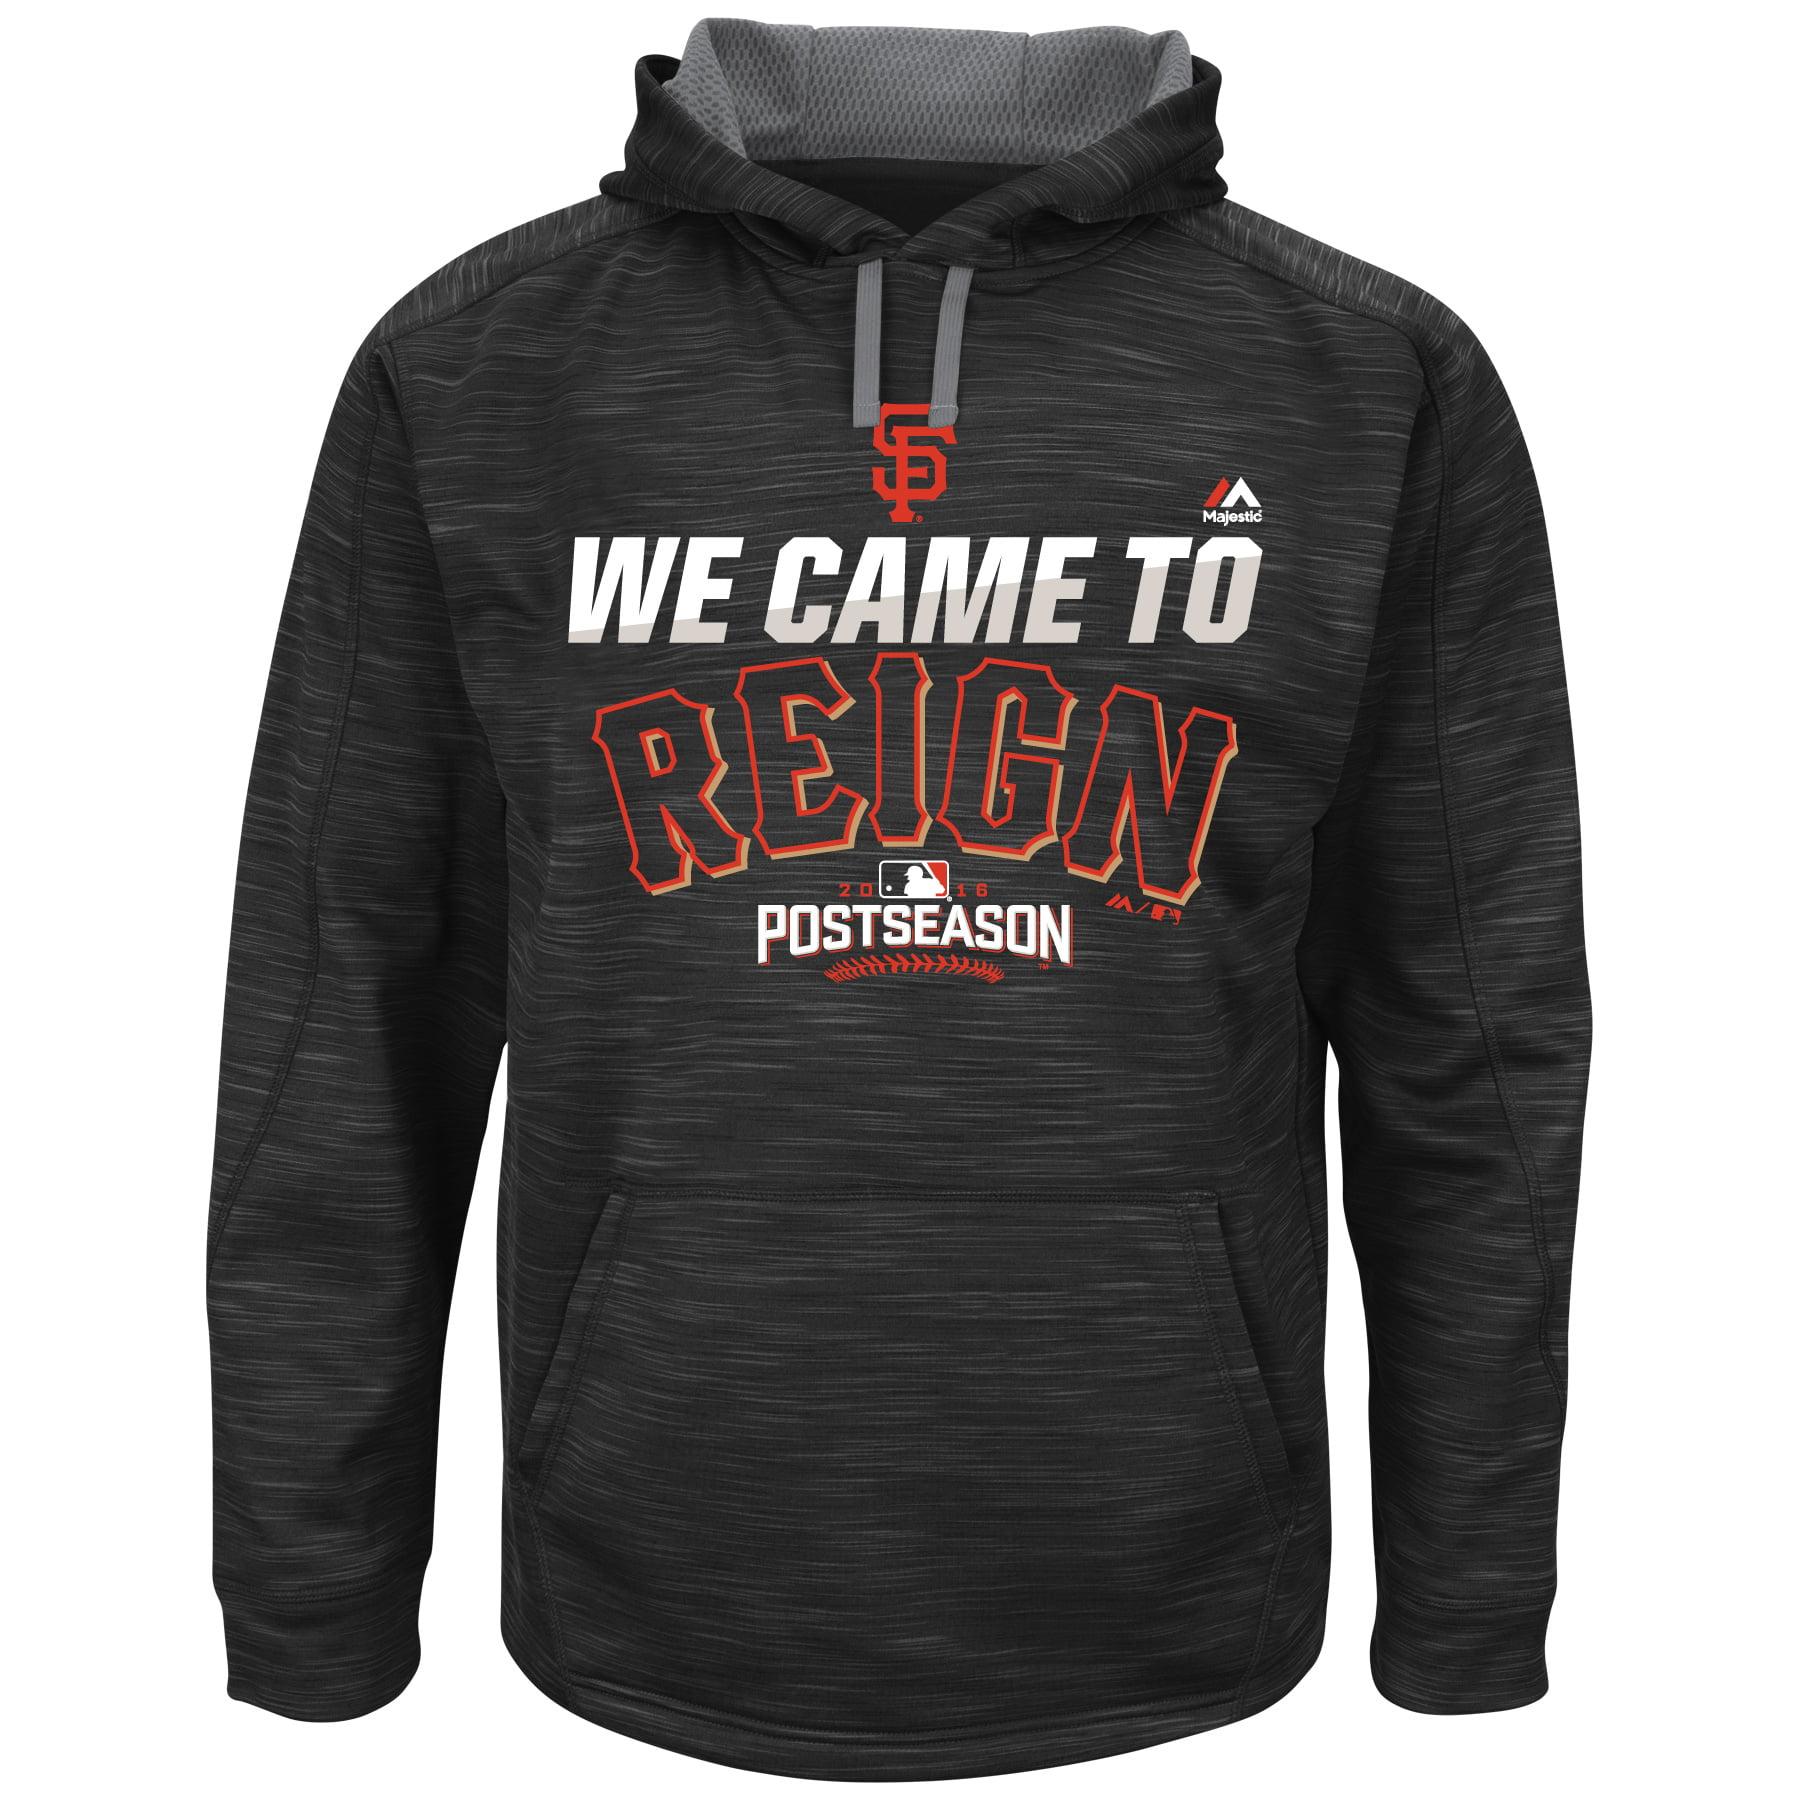 San Francisco Giants Majestic 2016 Postseason Big & Tall We Came To Reign Streak Fleece Hoodie - Black